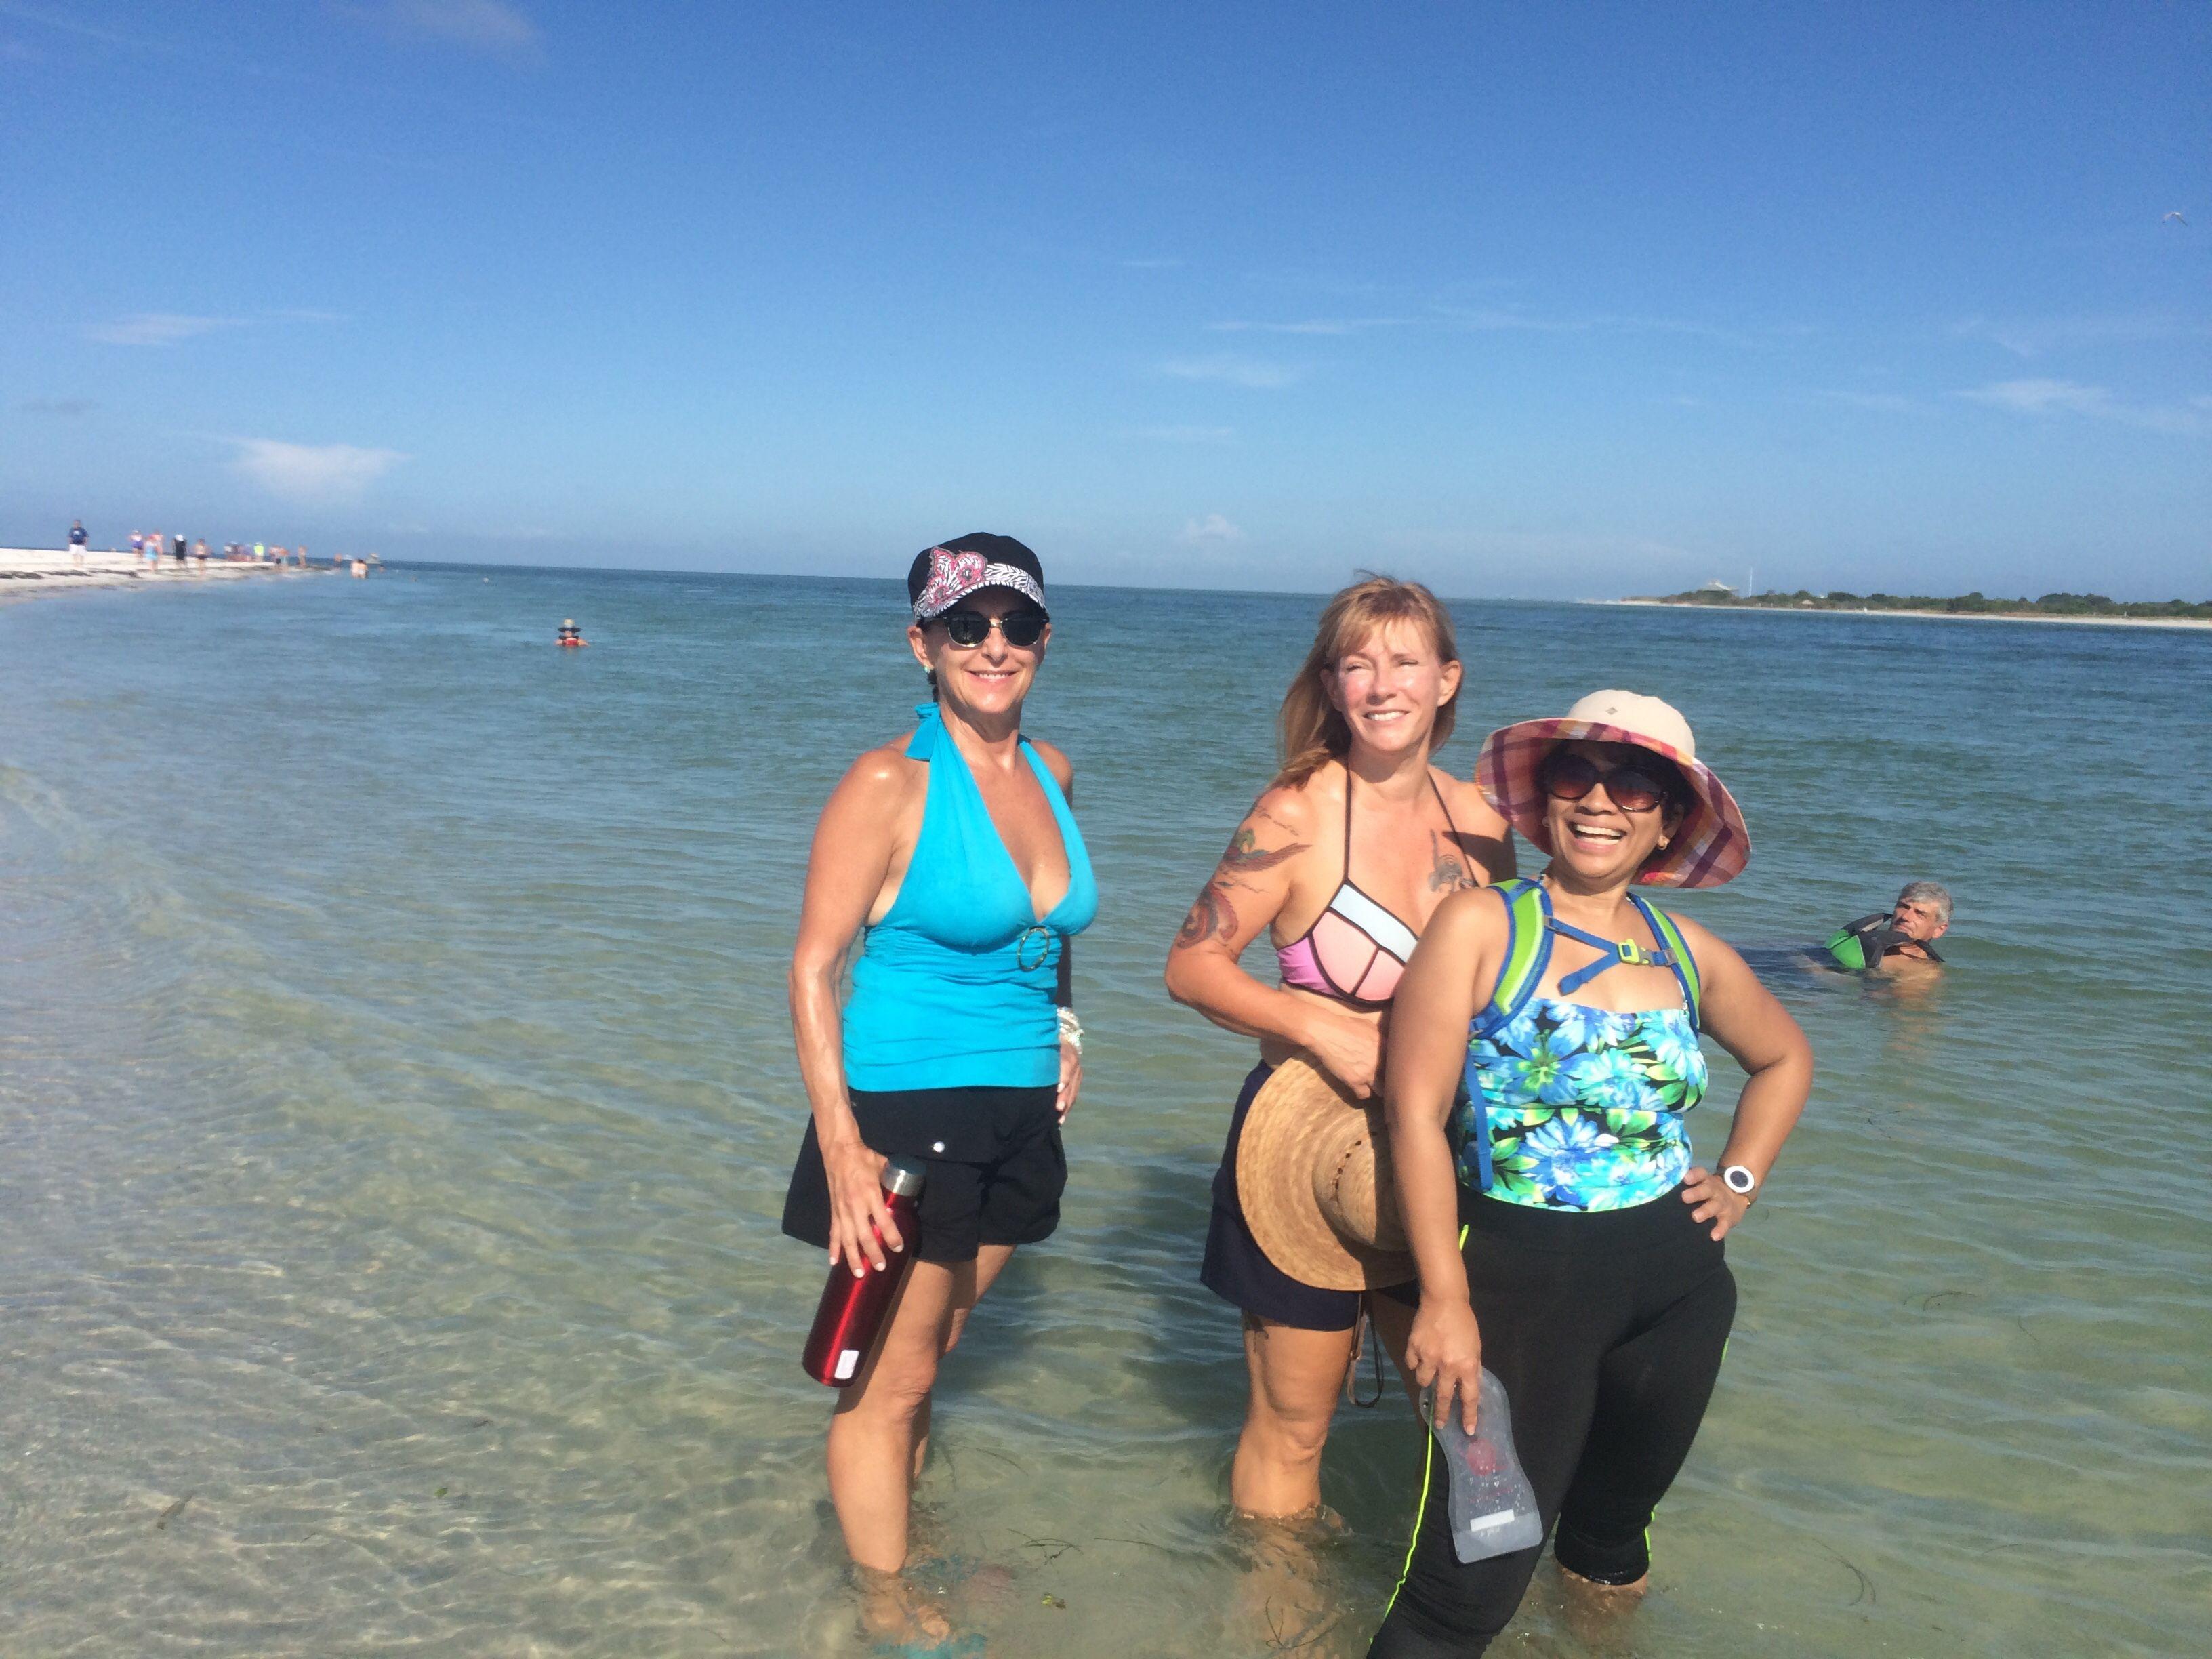 Bay area singles chat line Date Singles In Walvis Bay, Erongo - Meet & Chat Online